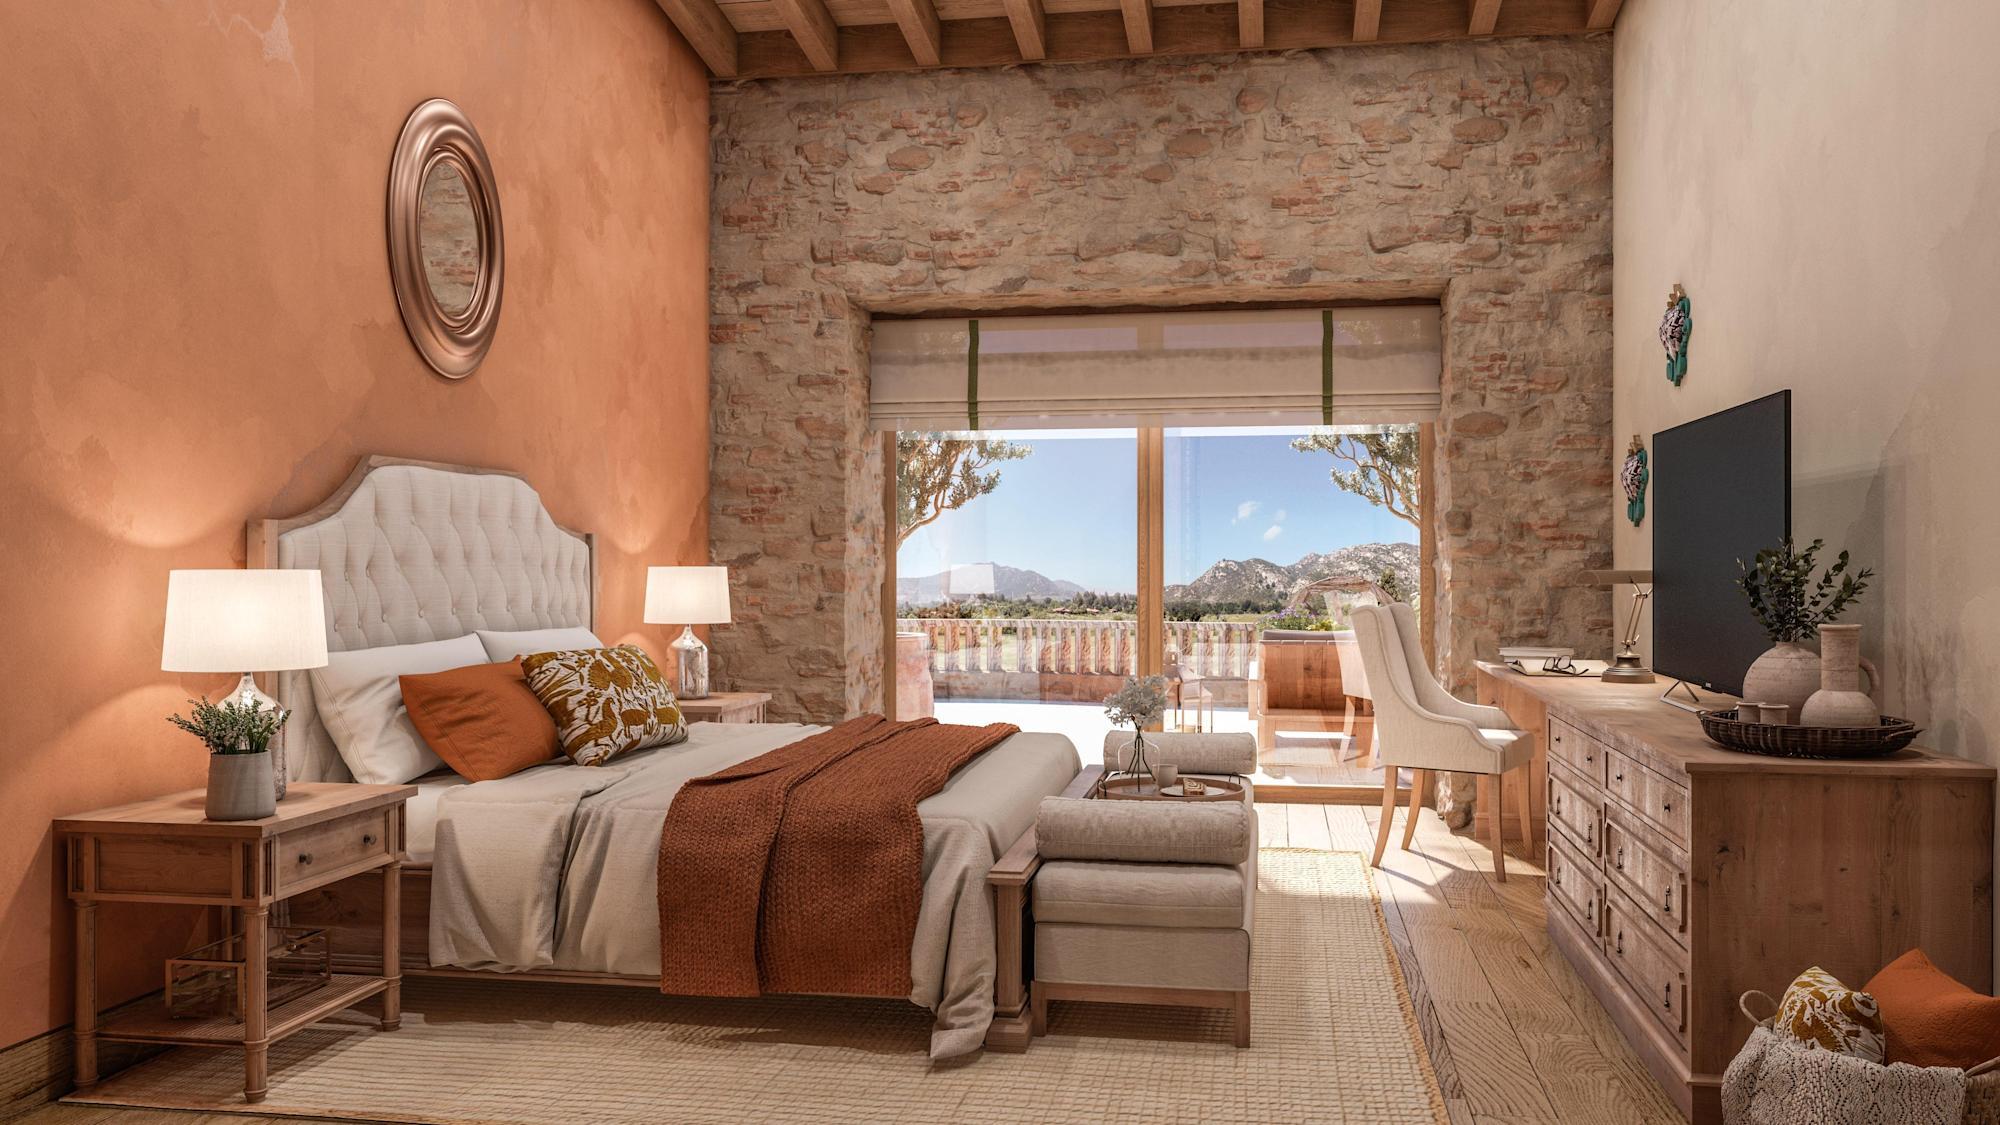 As Travel Returns, Wellness Retreats Are Focusing on a Major Luxury: Sleep